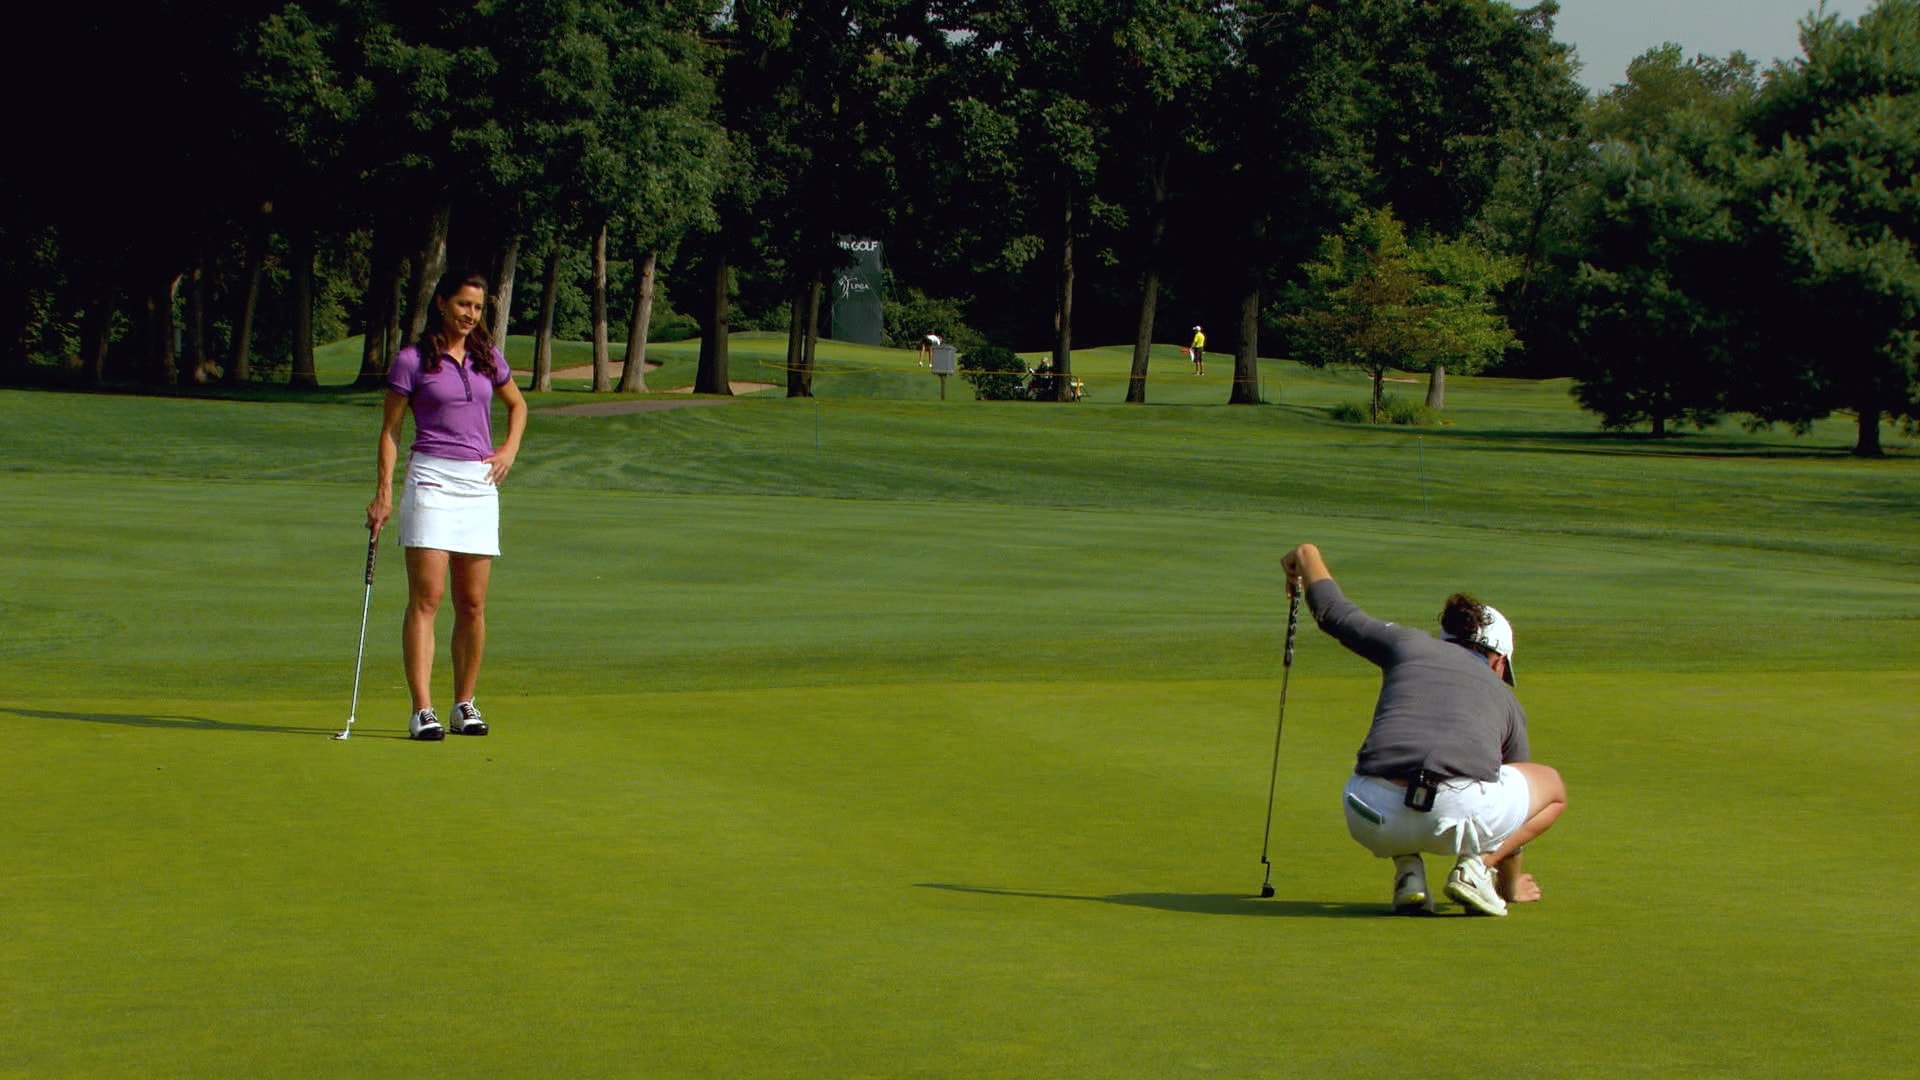 free golf instruction videos online